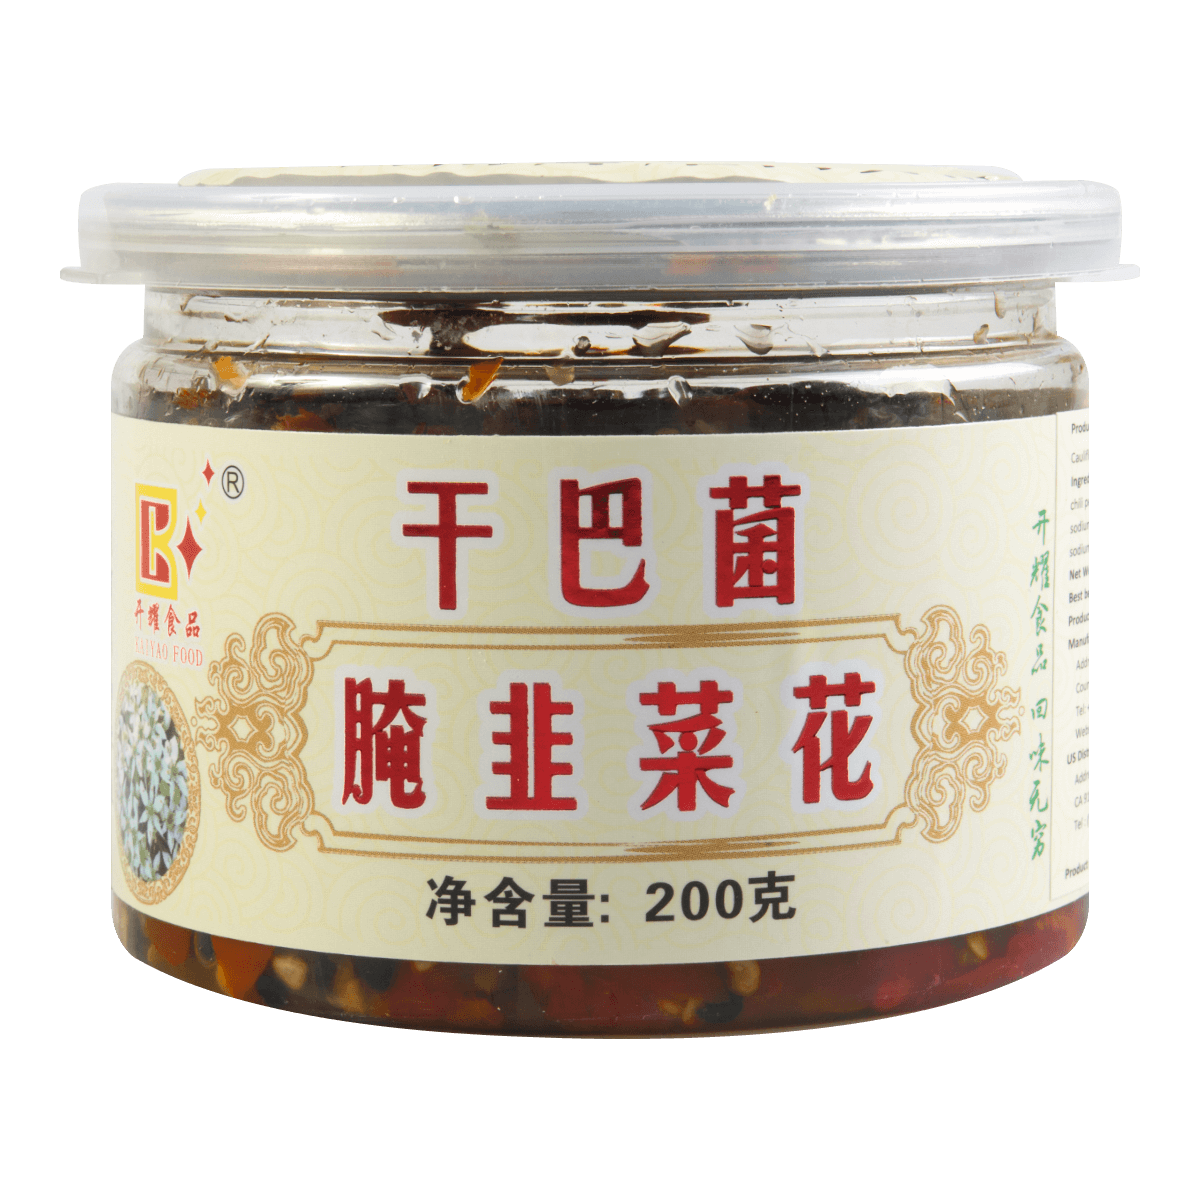 Yuannan Special Ganbayin Salted Leek Flower 200g